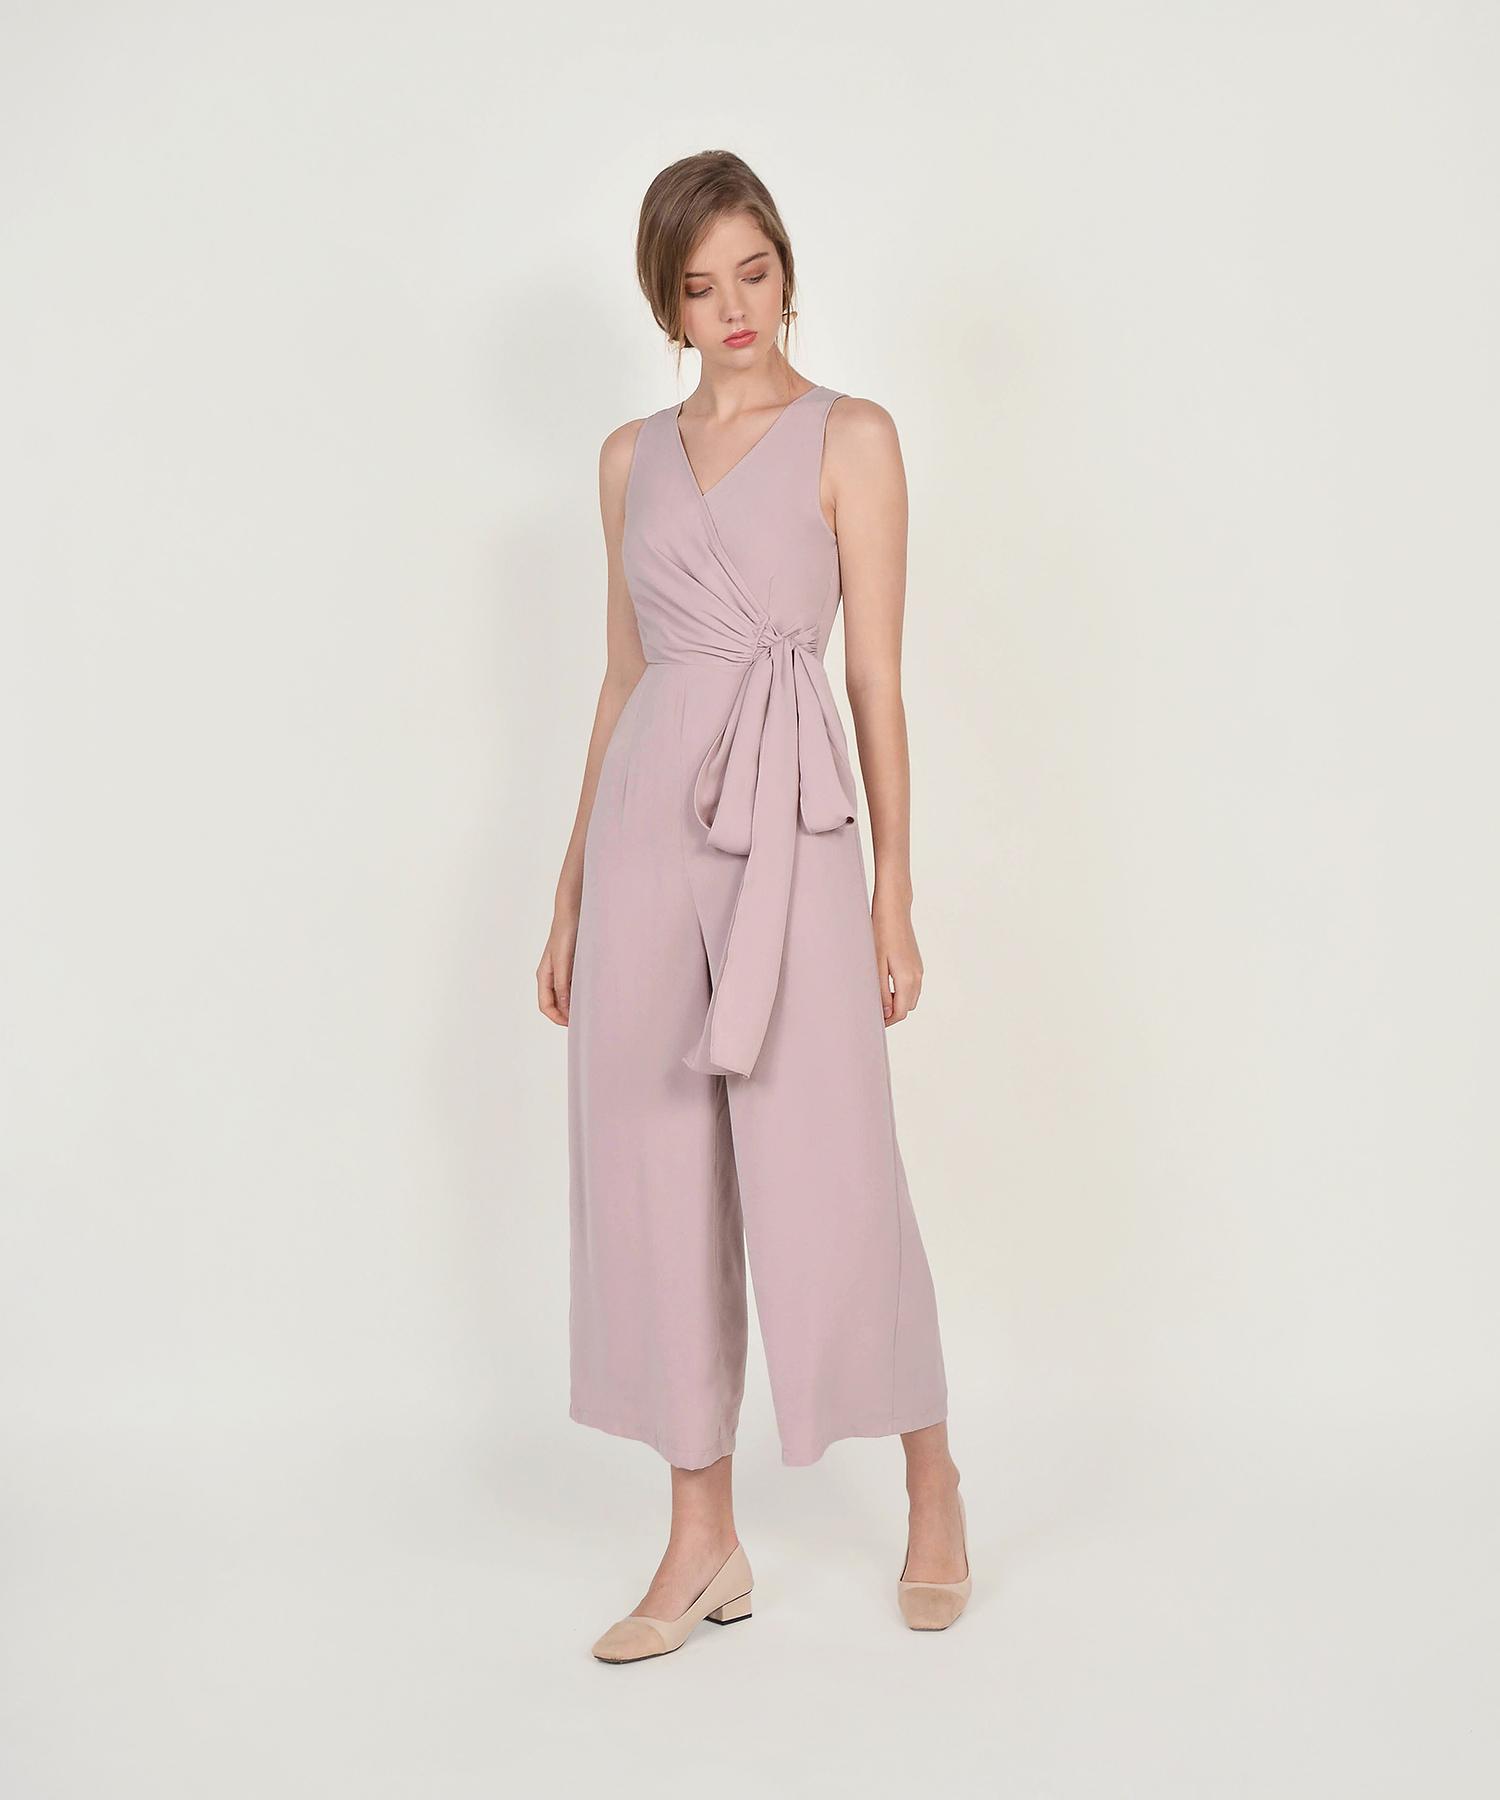 9283d8e11c4c Ambrosia Wrap Jumpsuit - Dust Pink | hervelvetvase